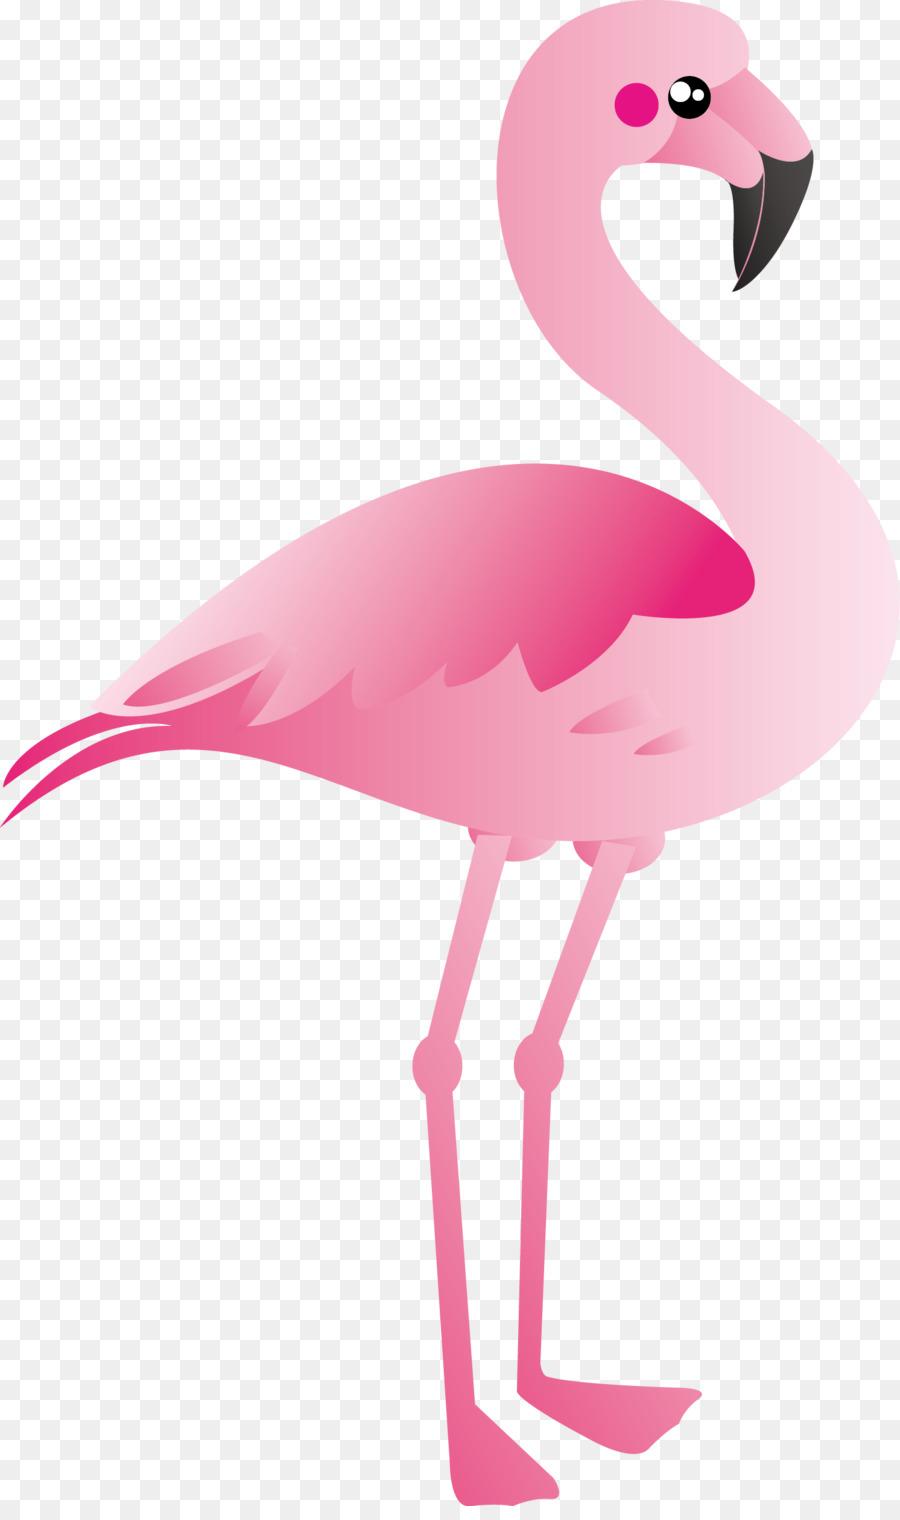 900x1520 Plastic Flamingo Clip Art